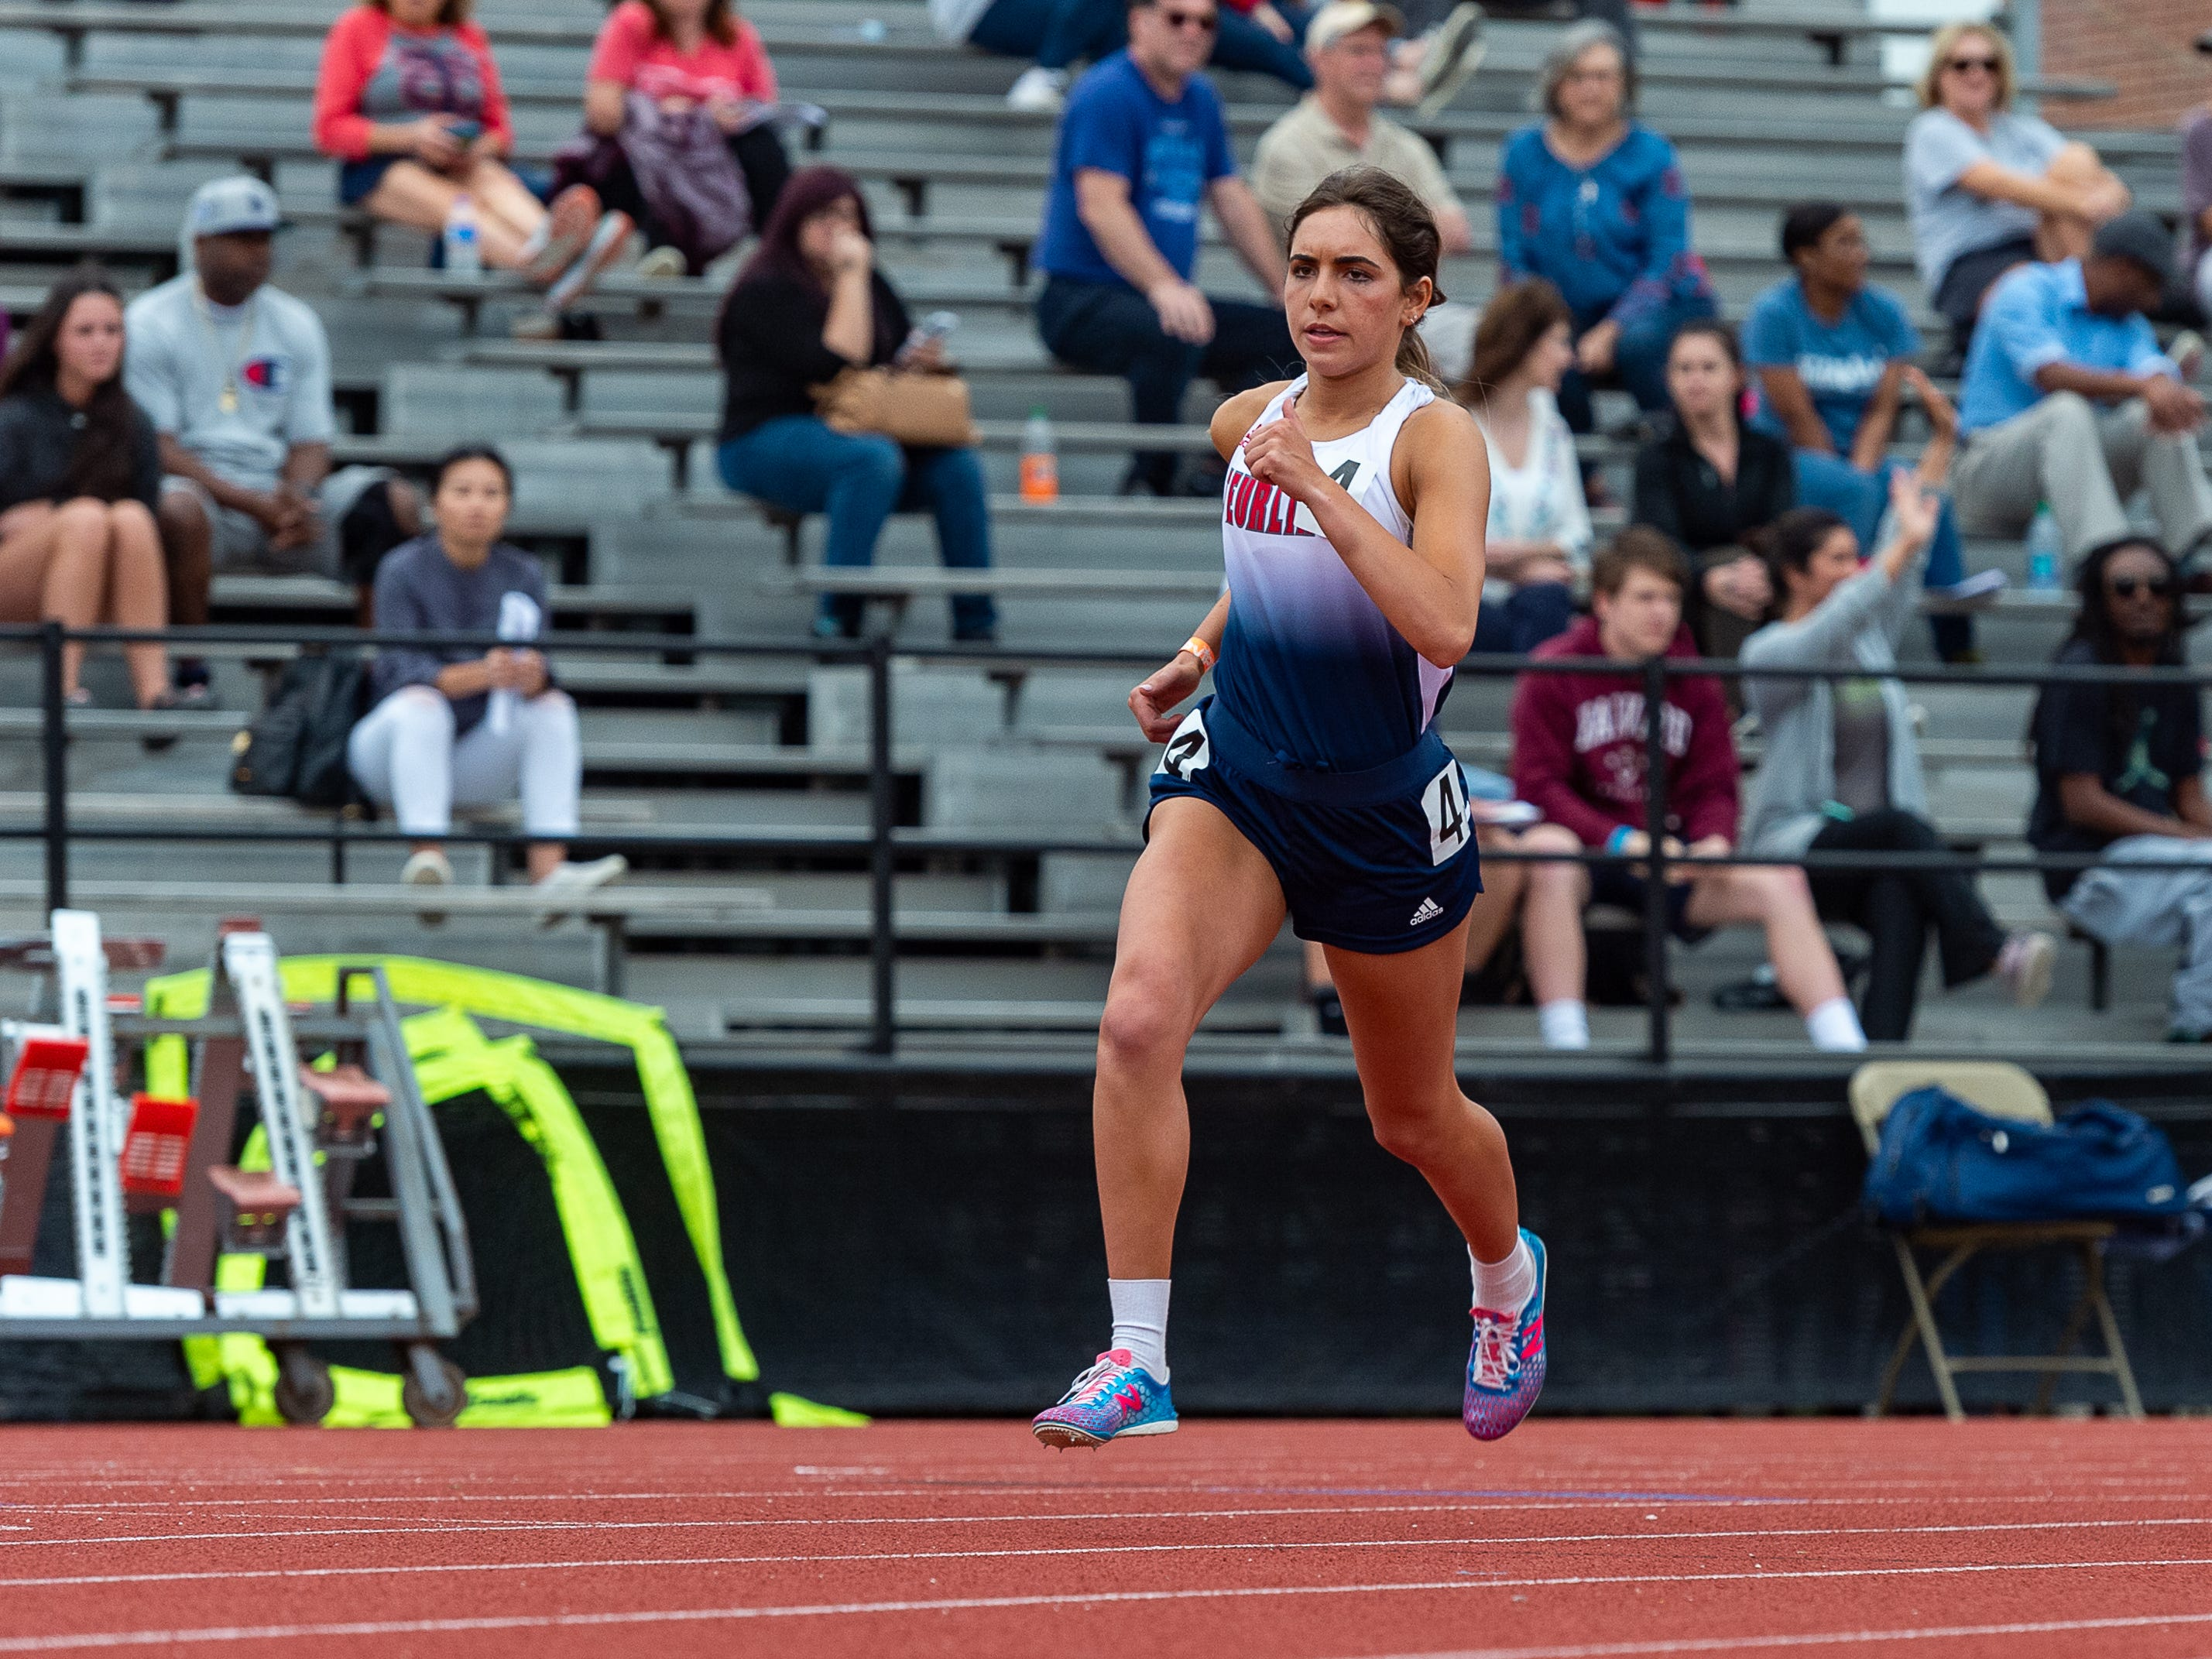 Makenzie Monlezum runs the 800m run at The 2019 Beaver Club Relays. Friday, April 5, 2019.